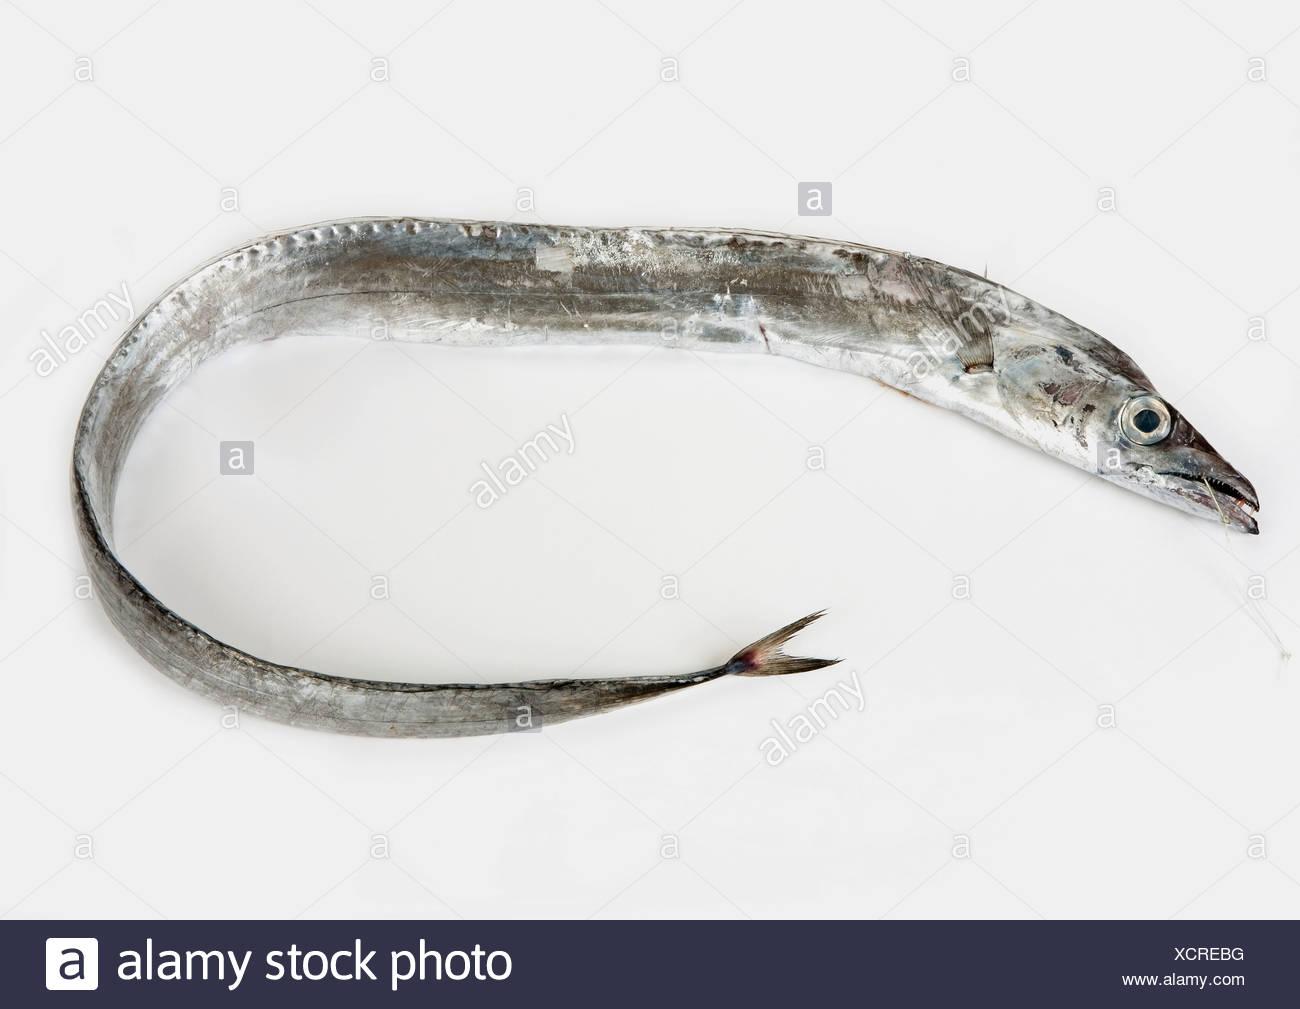 Silver scabbard fish, close-up - Stock Image